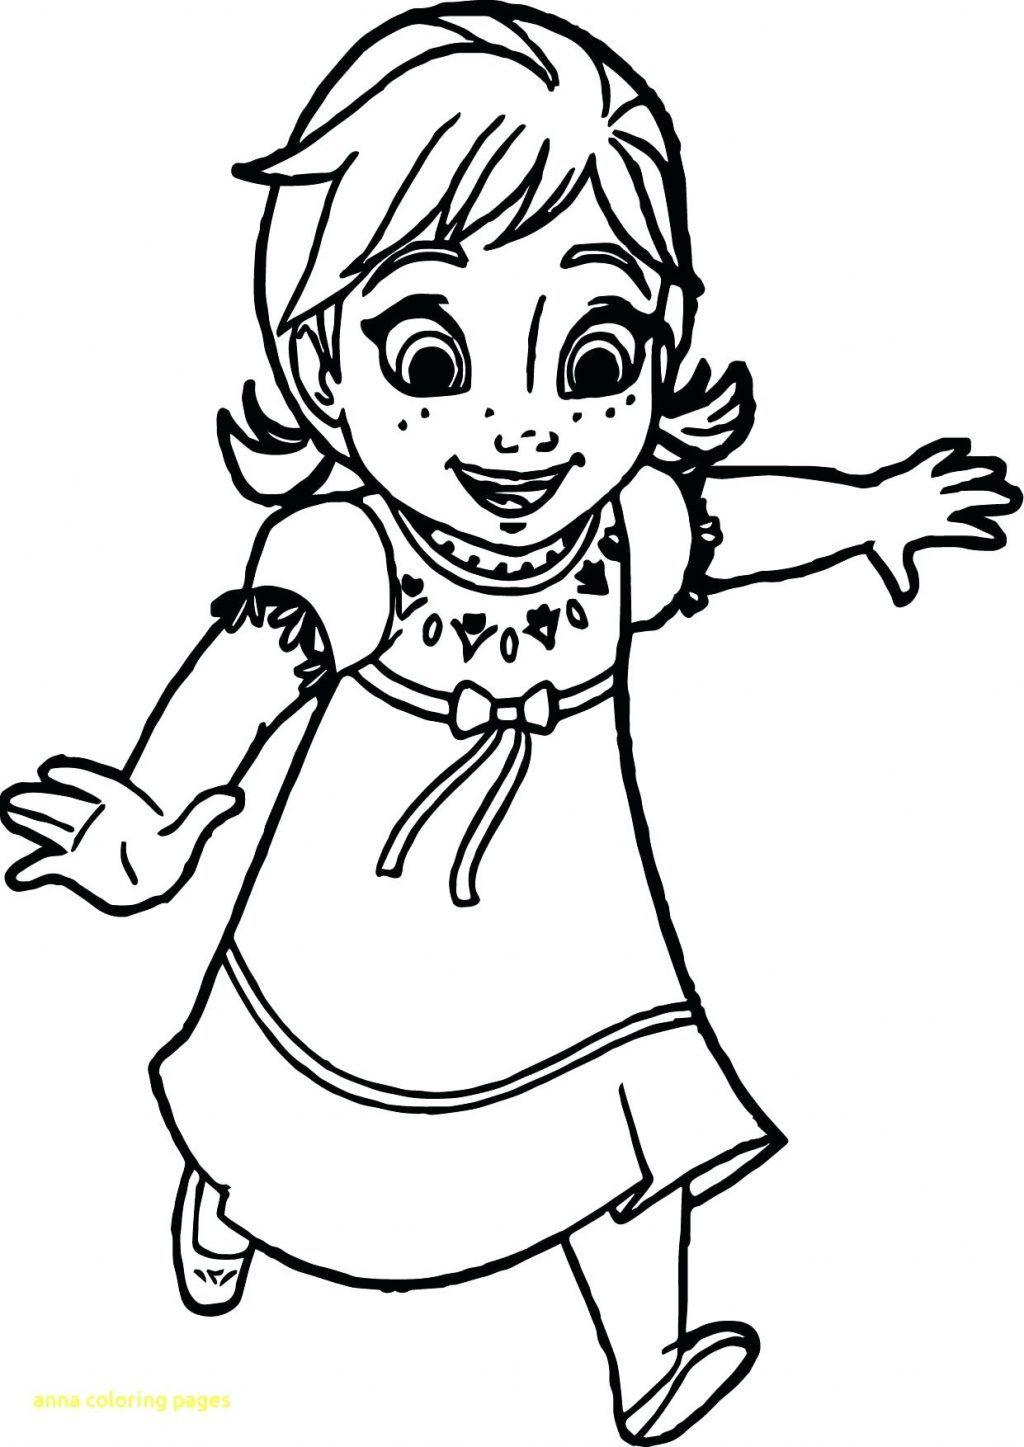 anna coloring pages coloring page coloring page fabulous